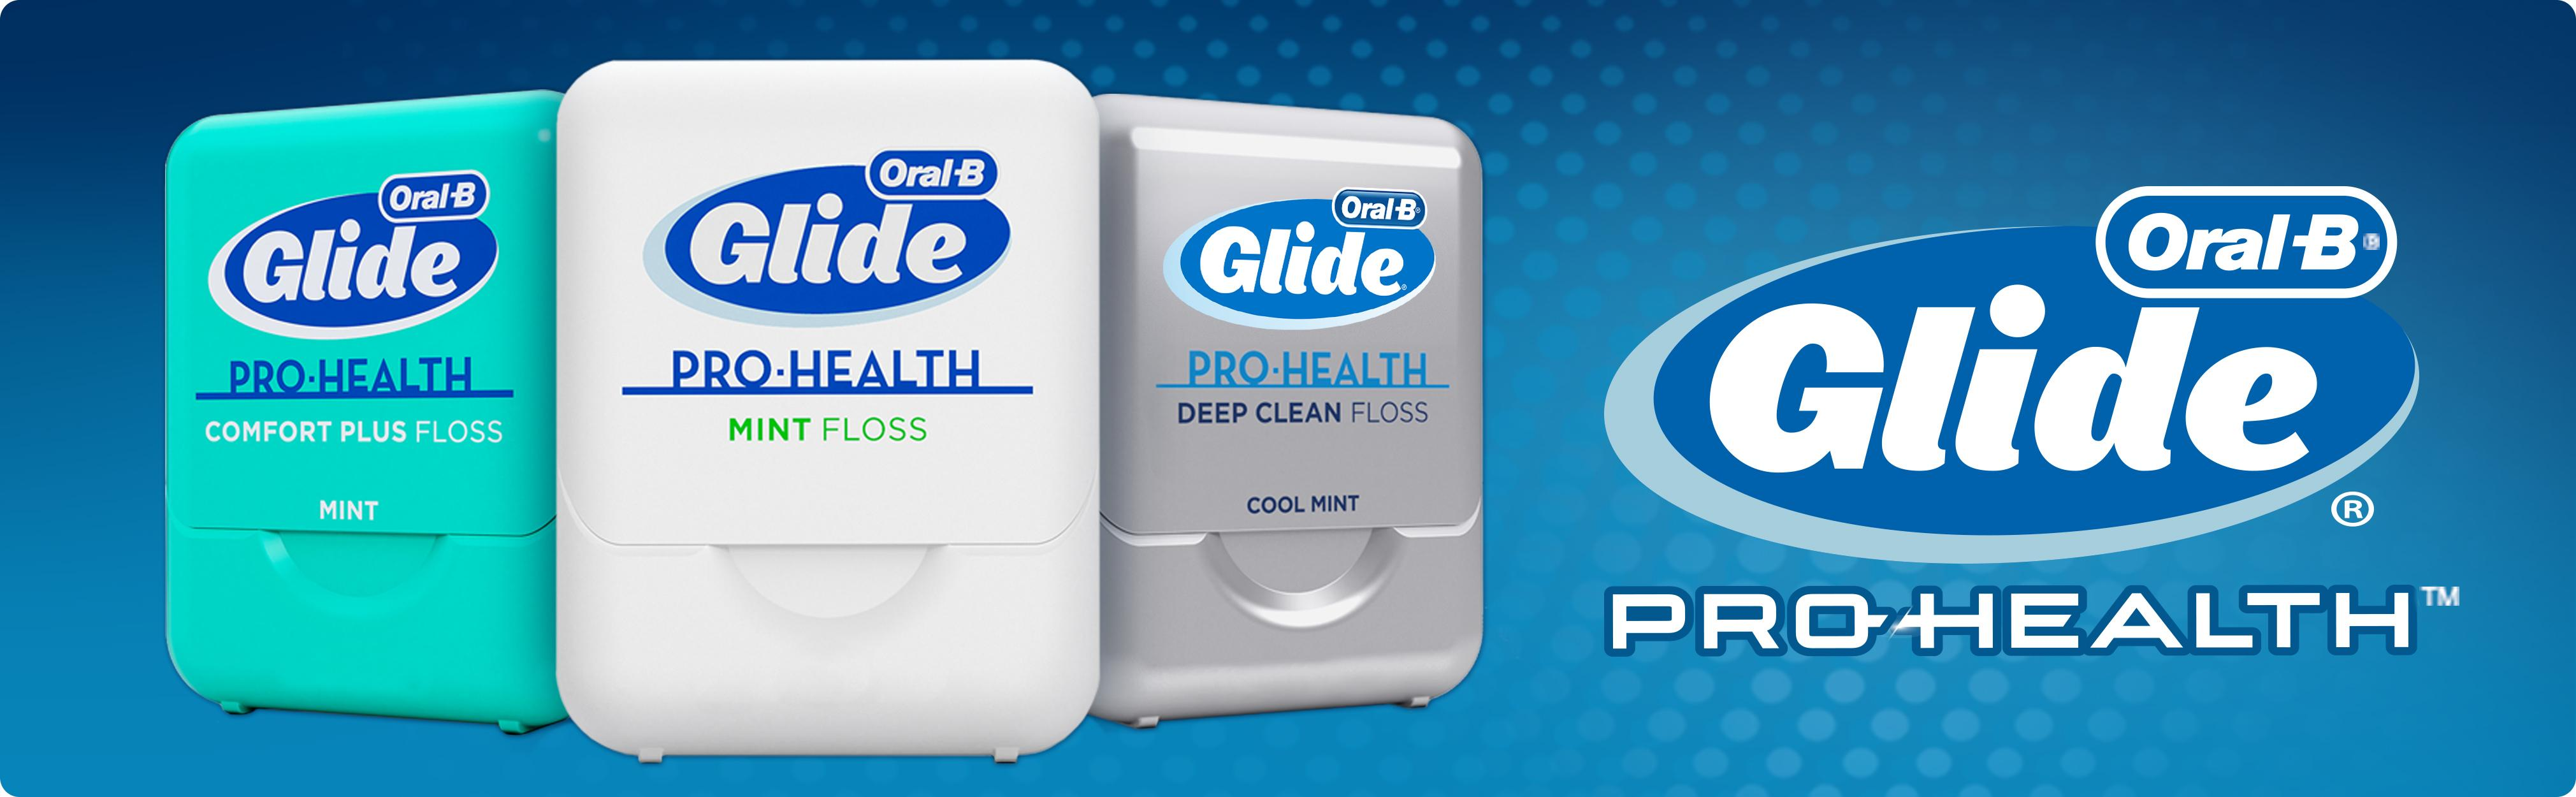 glide pro health deep clean floss